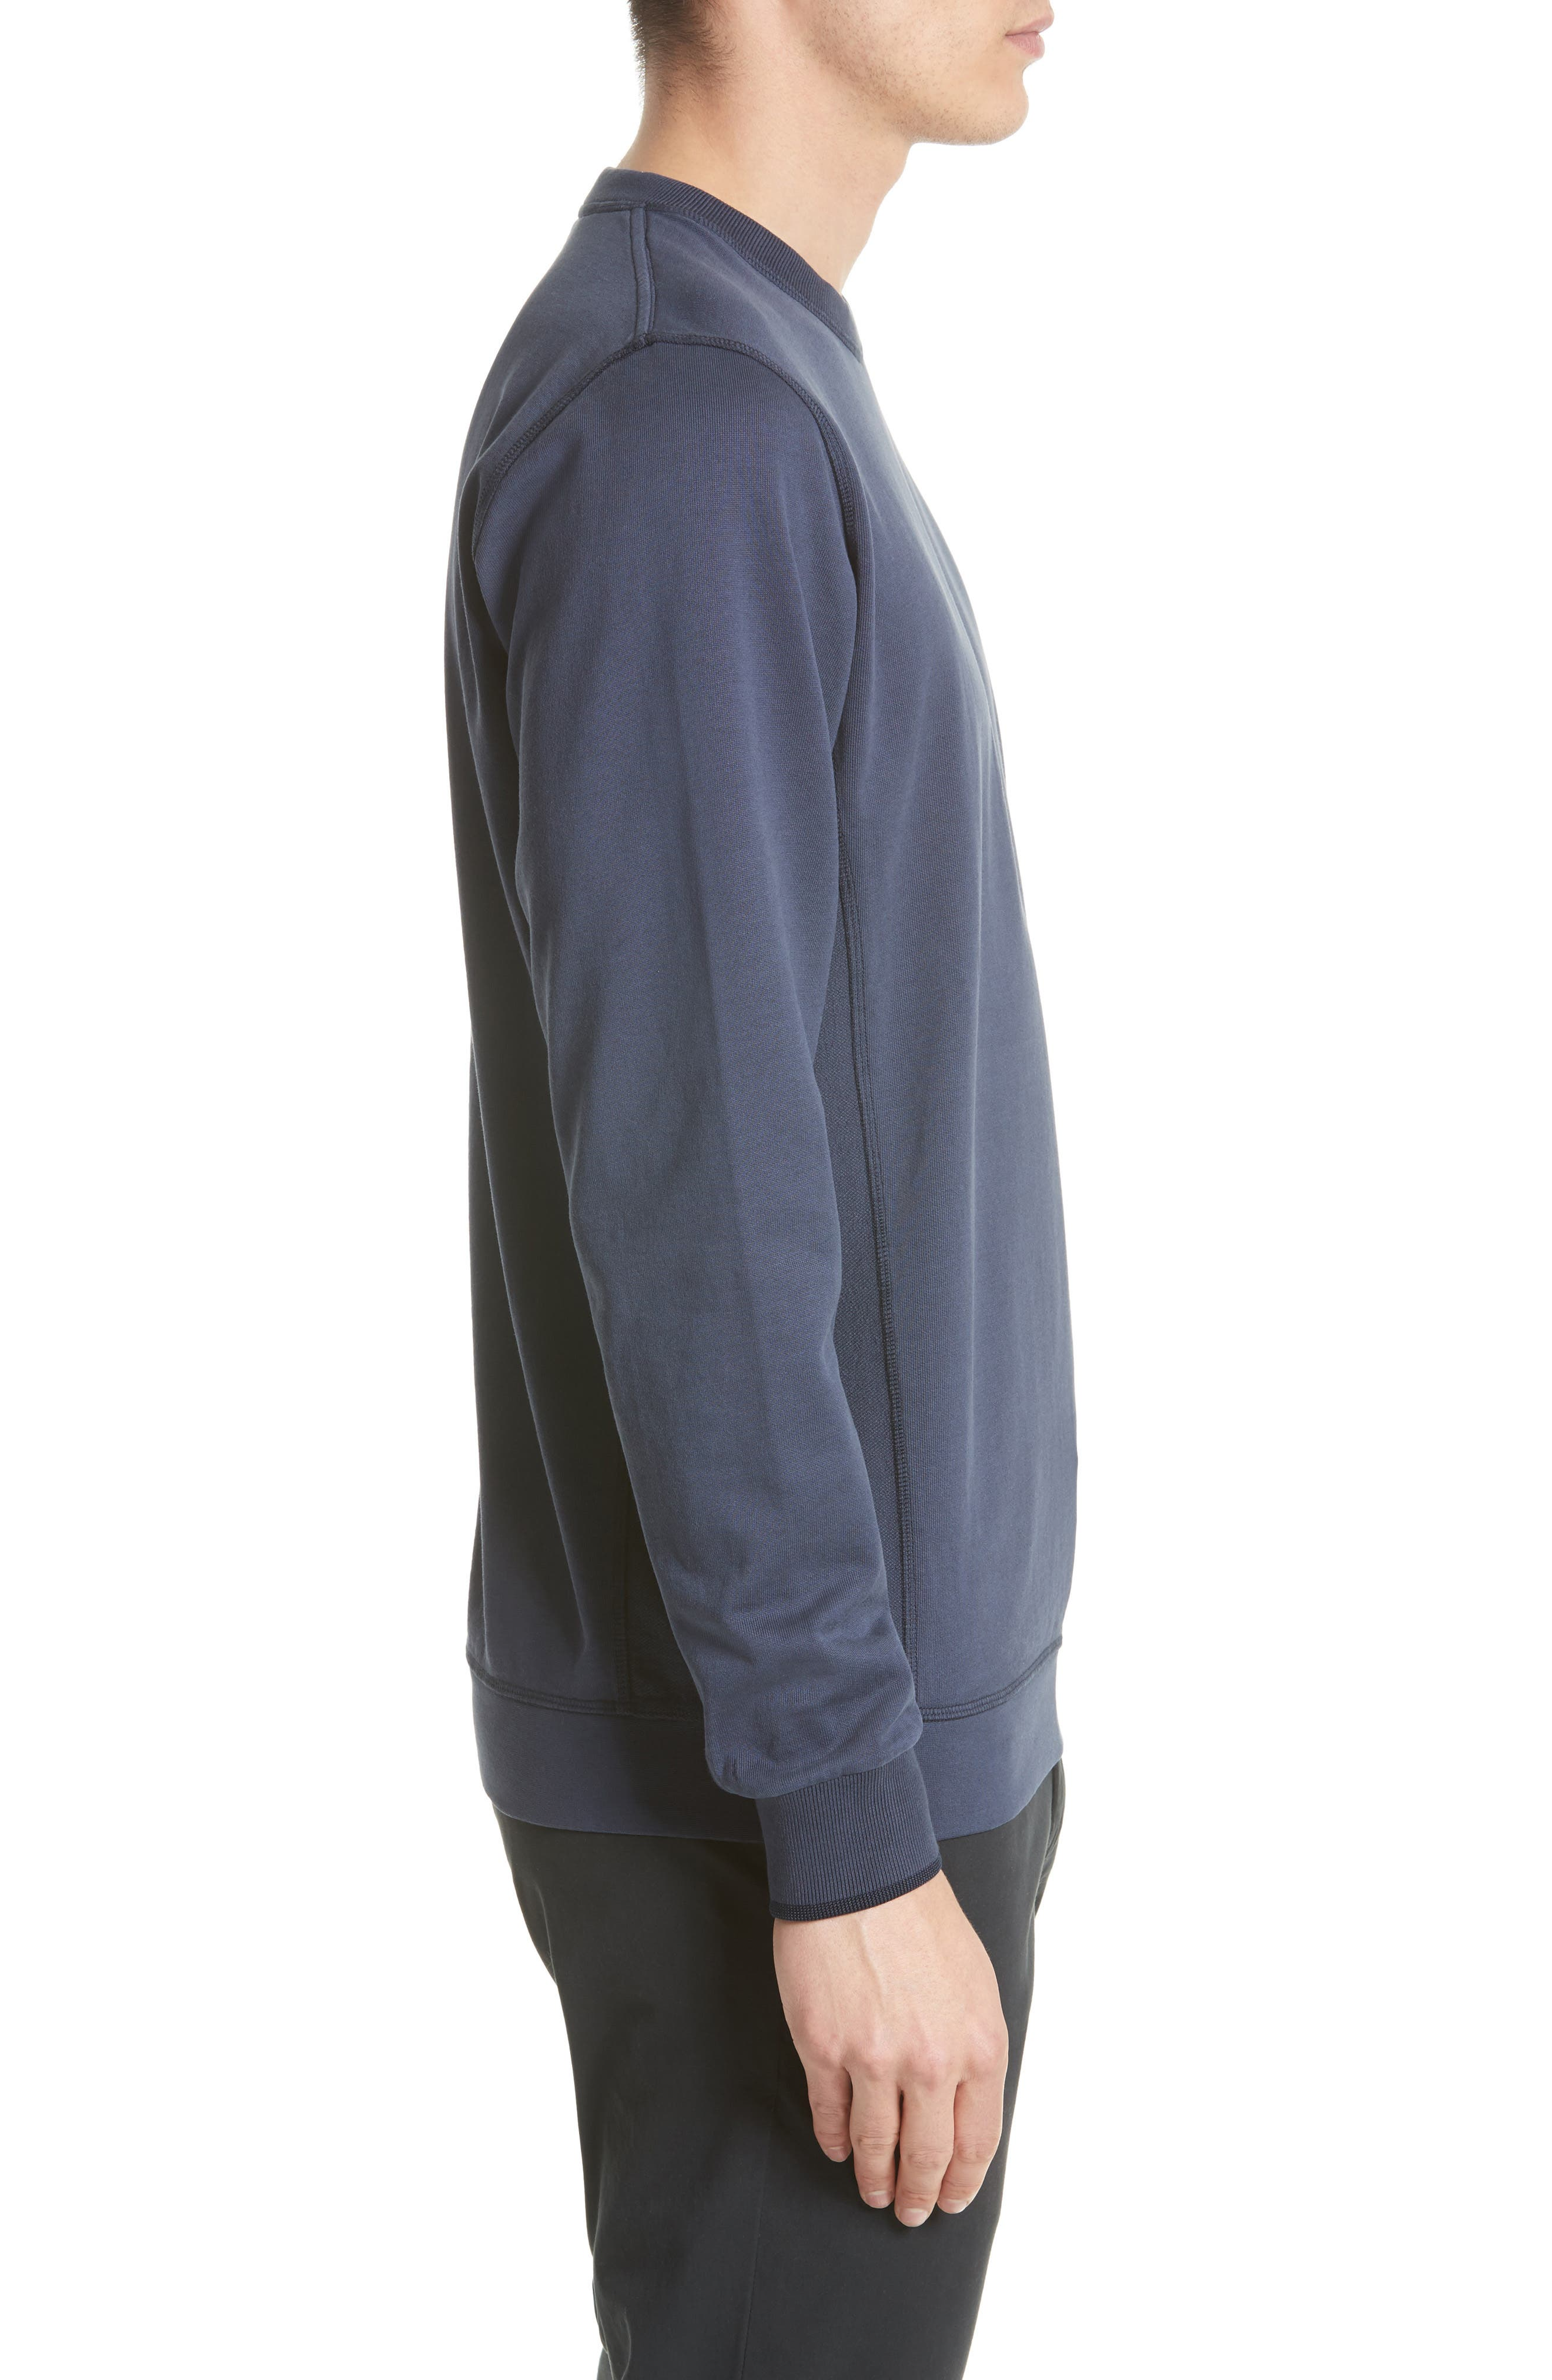 Vagn Mercerized Fleece Sweatshirt,                             Alternate thumbnail 3, color,                             401